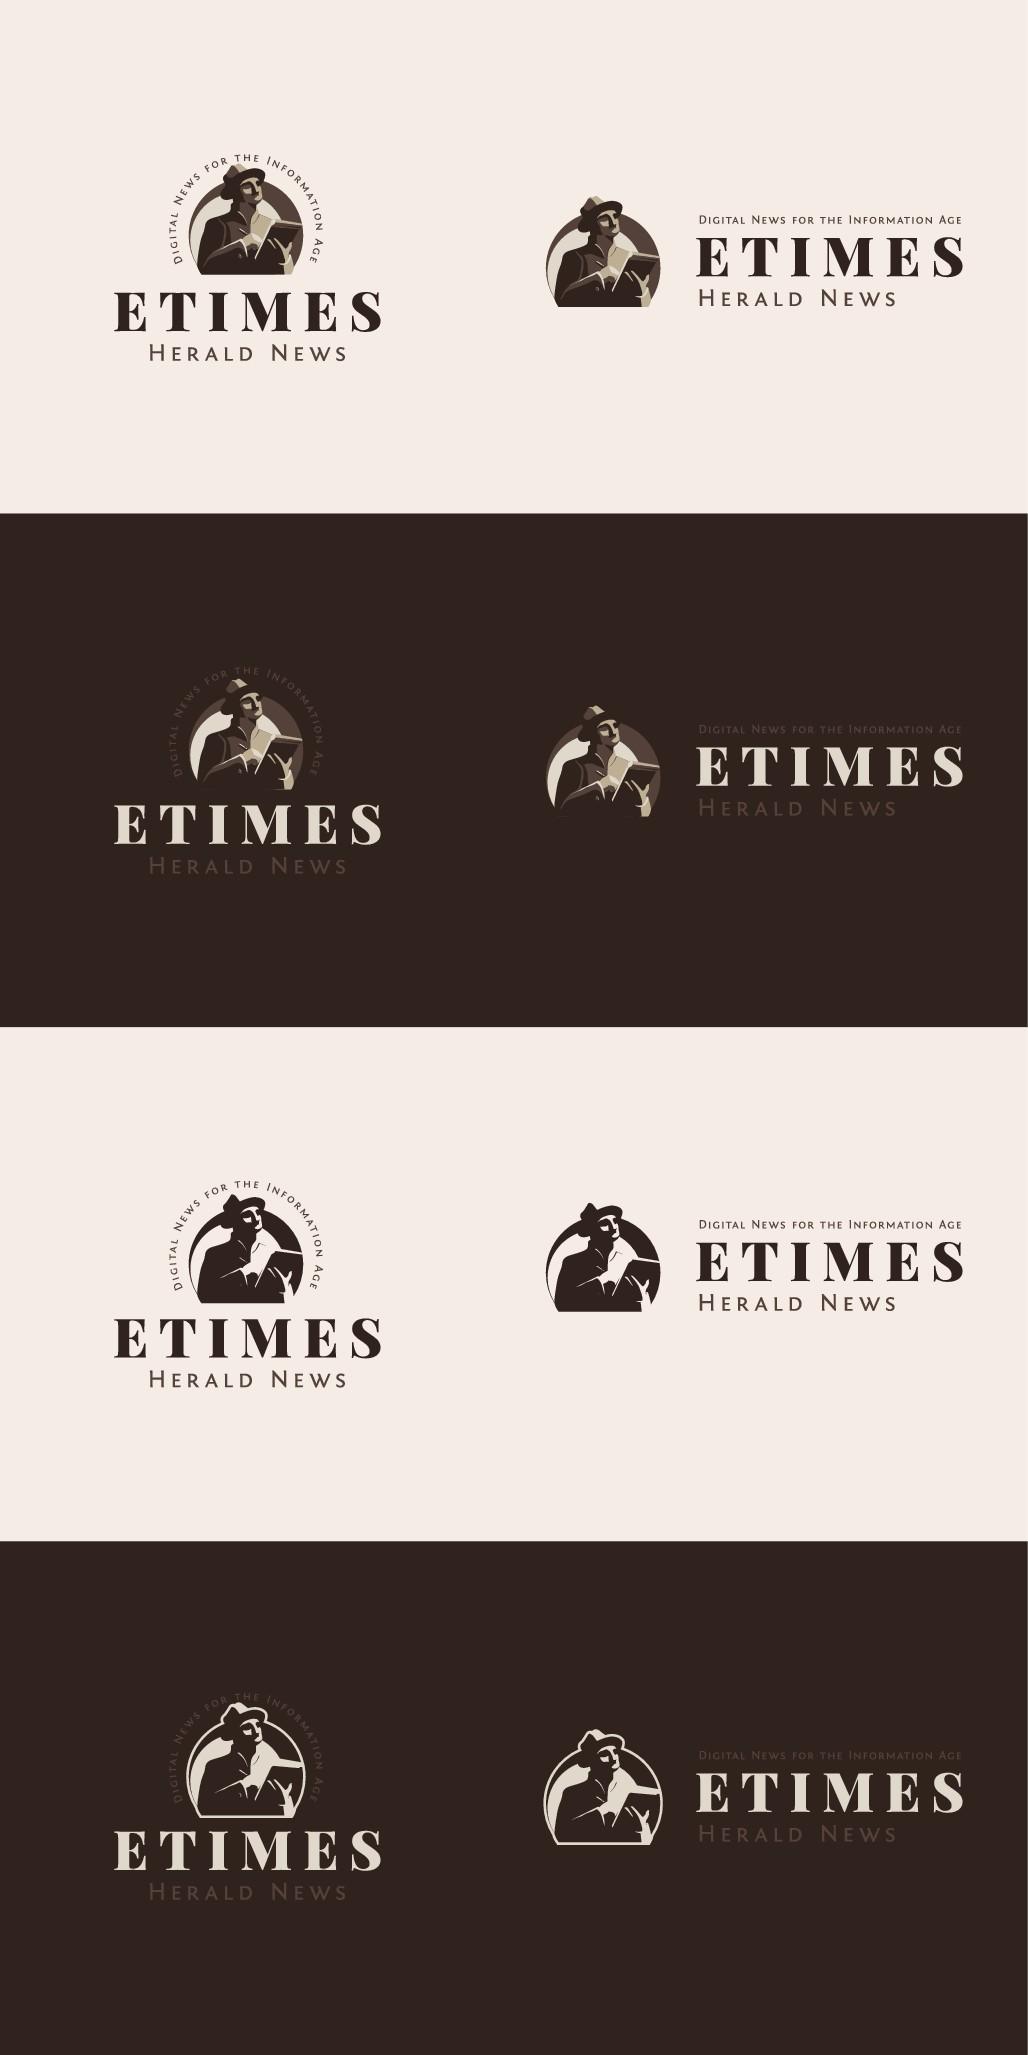 eTimes Herald News logo design contest